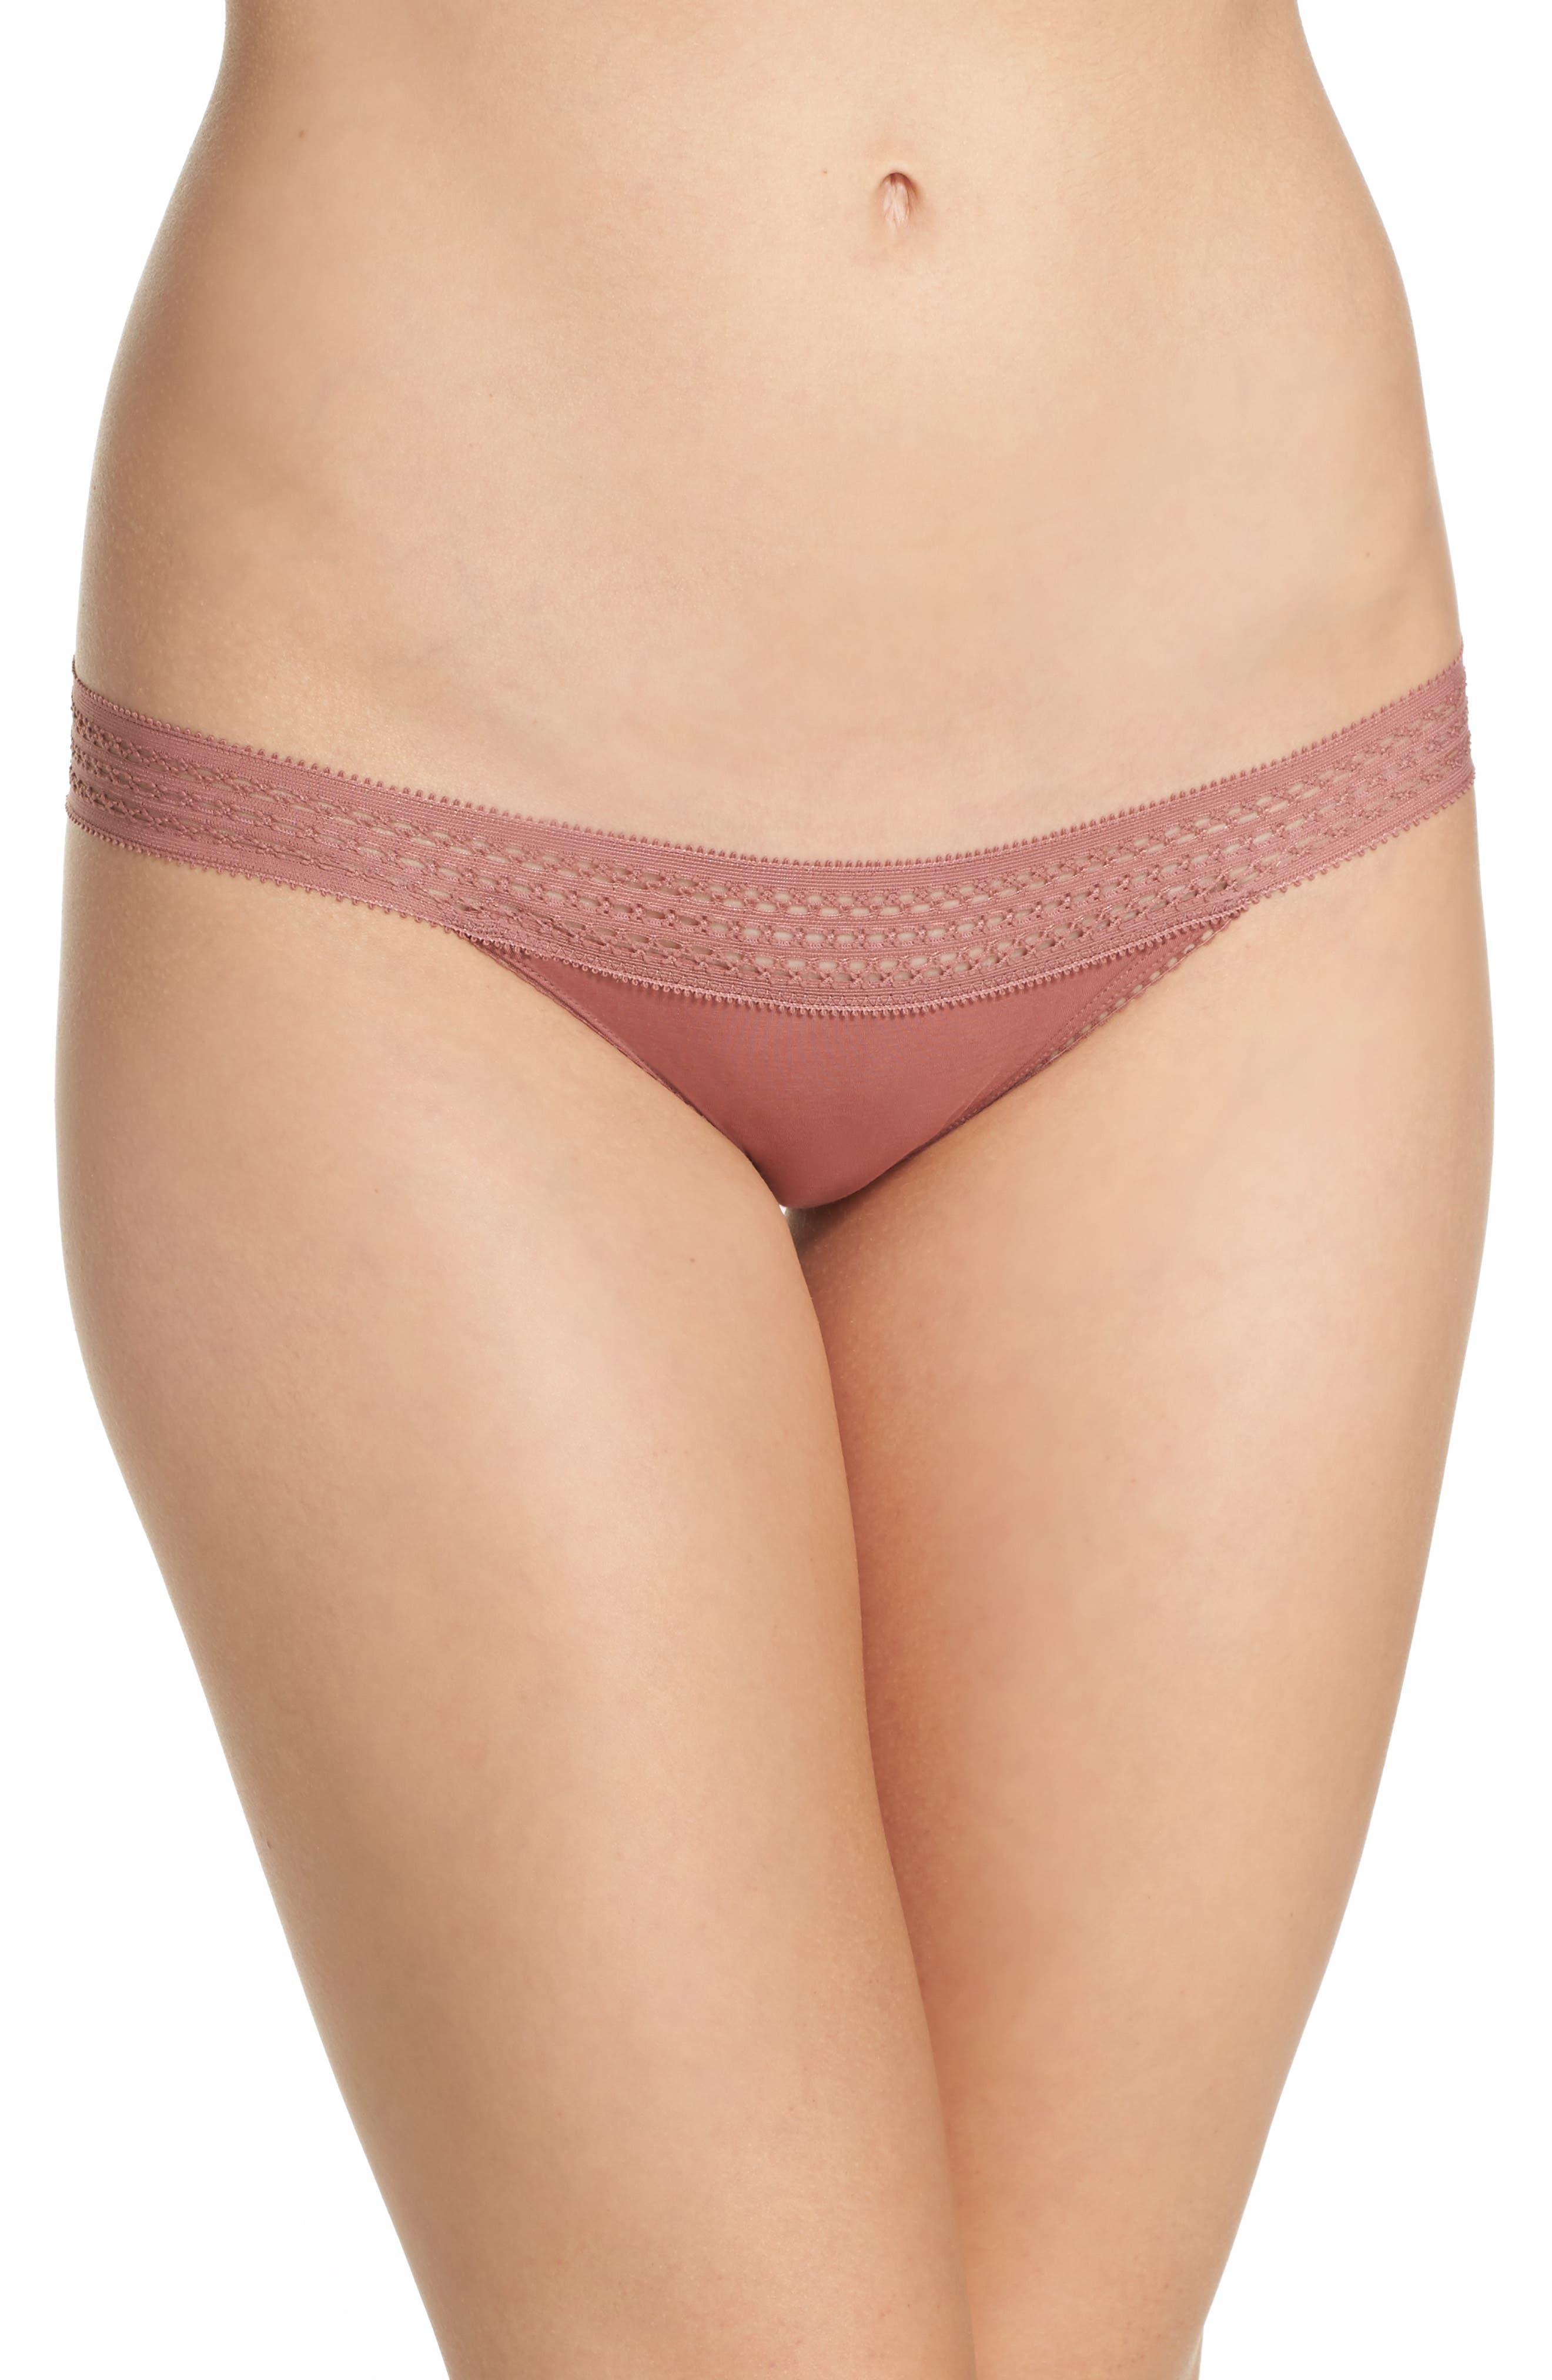 Alternate Image 1 Selected - DKNY Bikini (3 for $33)